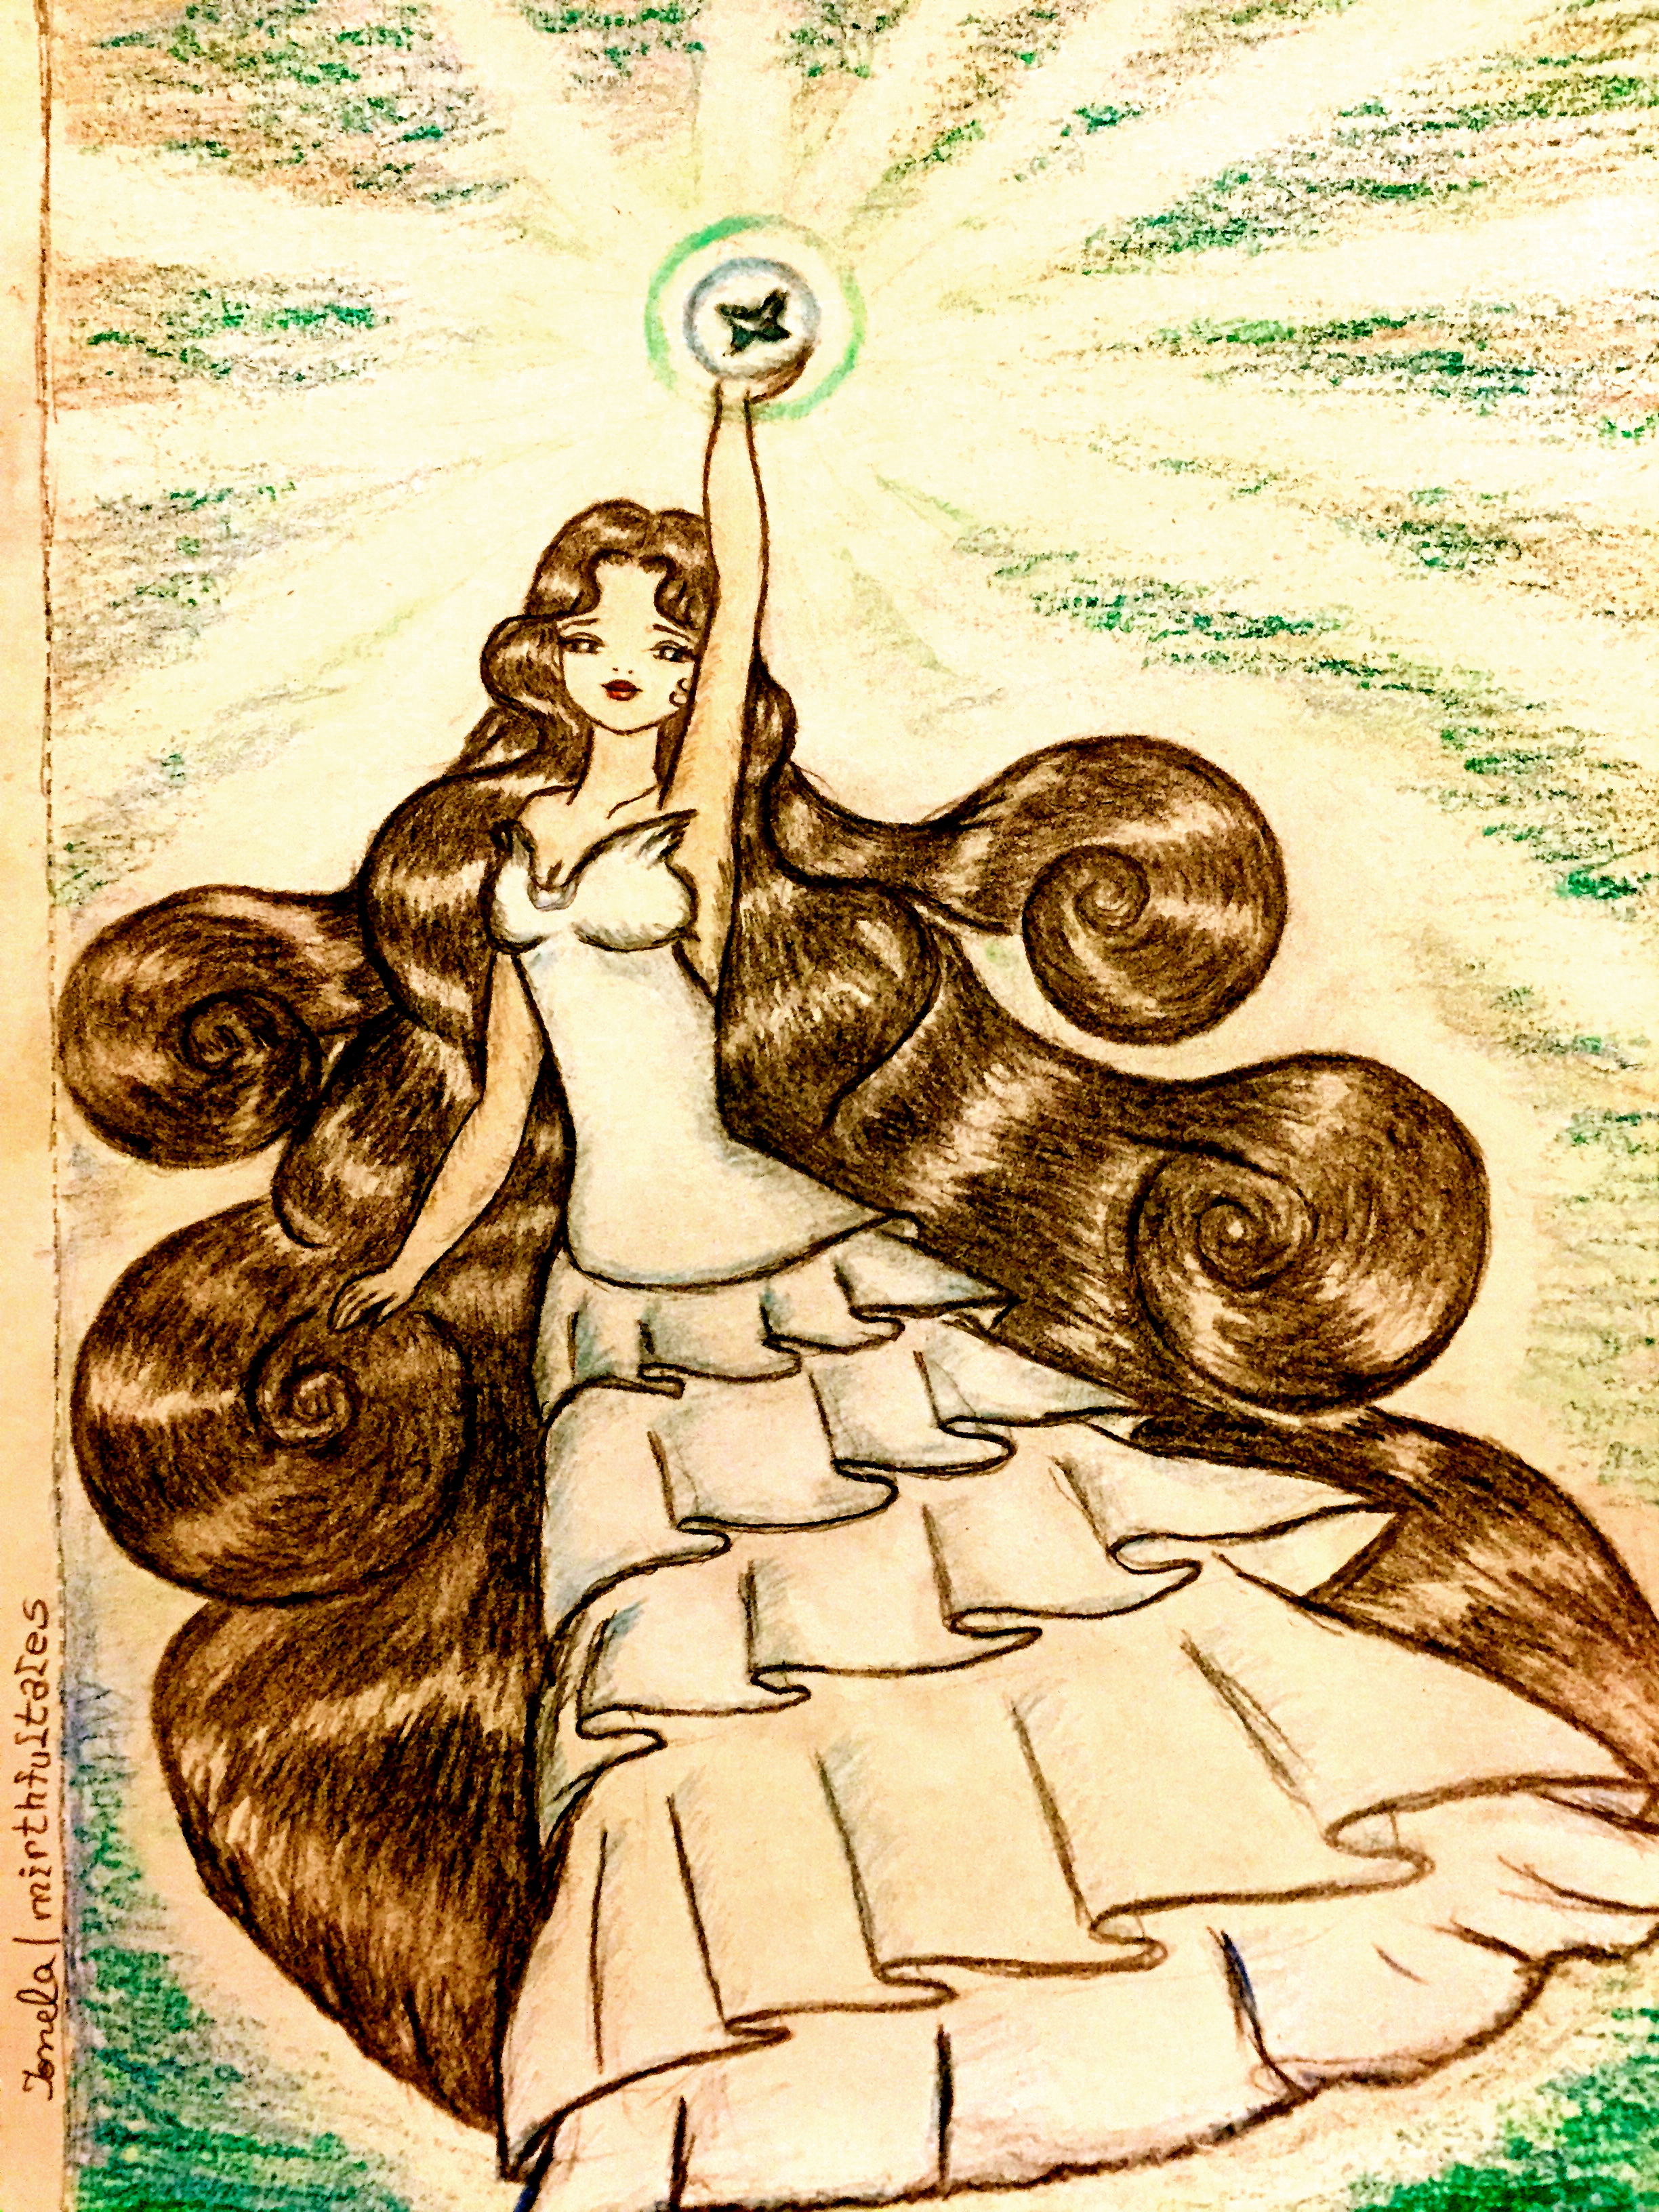 fairy-carmen-casting-a-spell-mirtthfultales